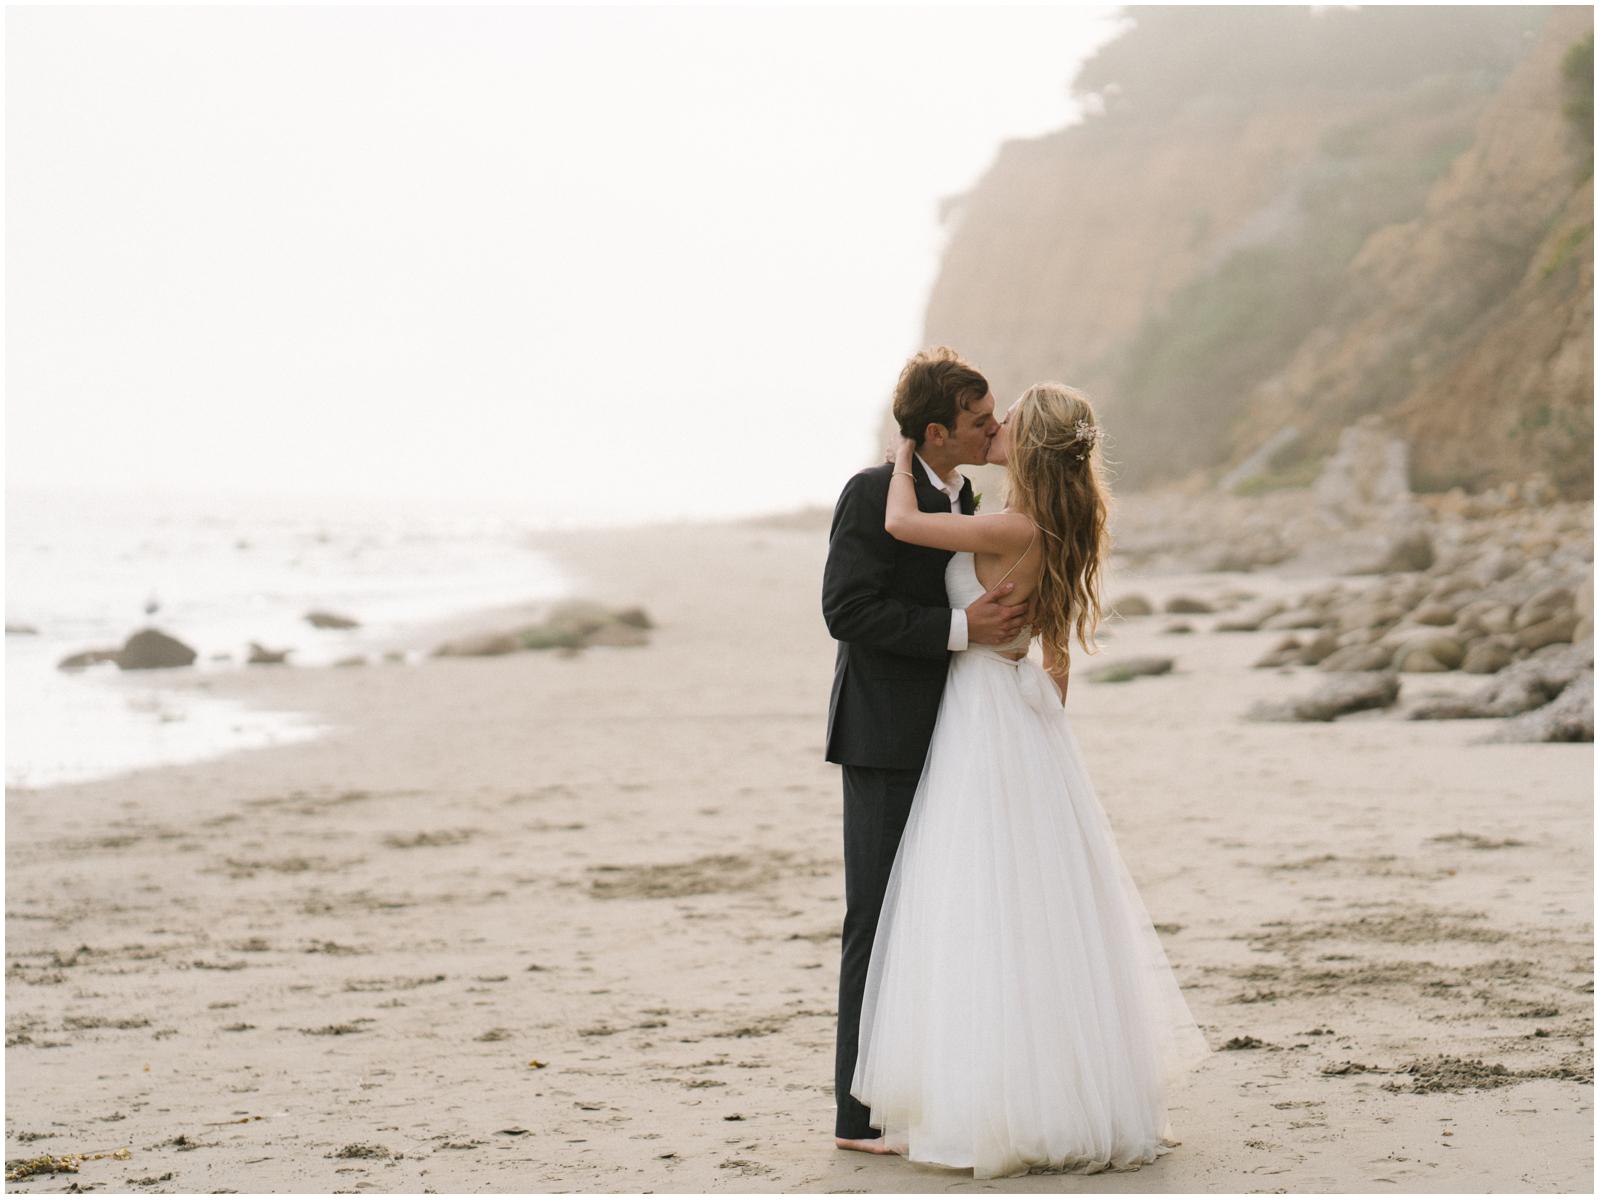 Santa Barbara Elopement Wedding Photographer - Pinnel Photography 1-1-2.jpg